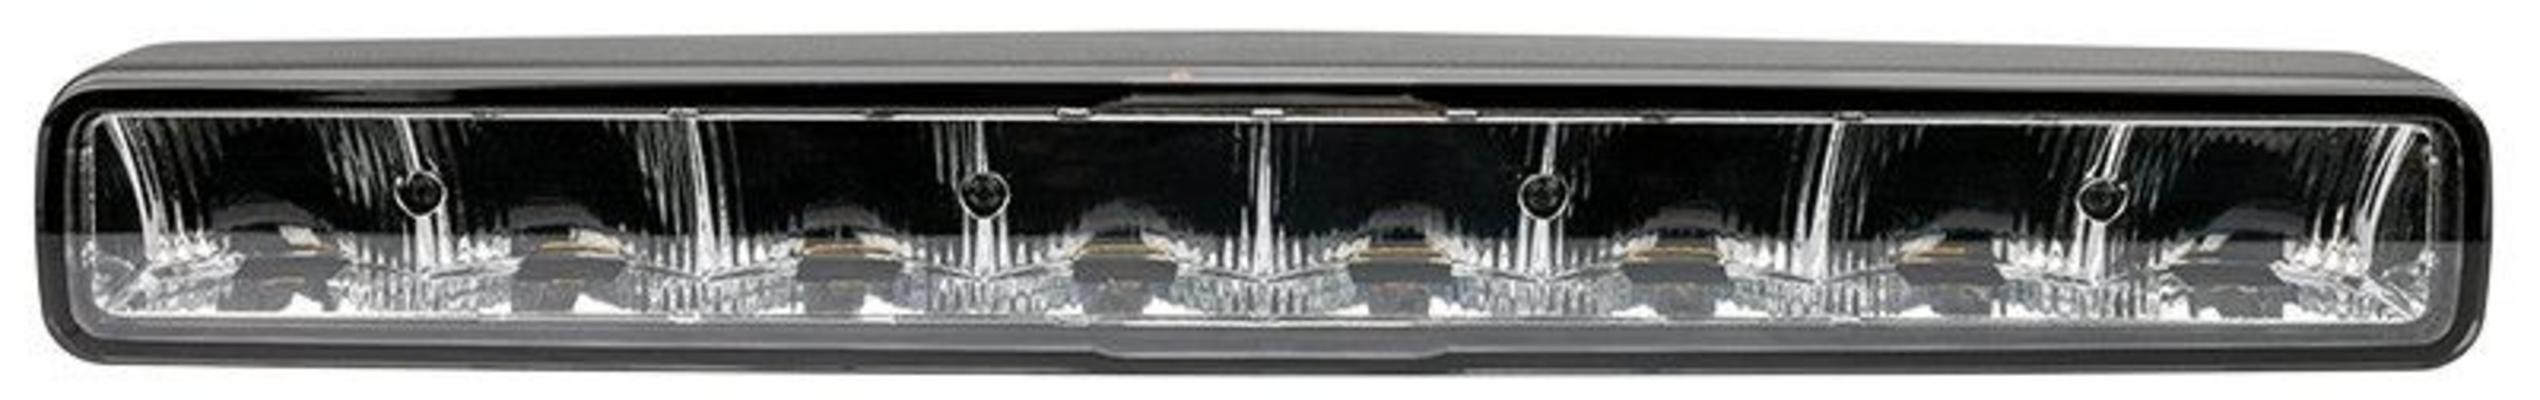 Led-lisävalo Mirage - Suora   52 cm   7100 lm   Ref. 50, Nordic lights - Led-lisävalo (120 W), Nordic lights